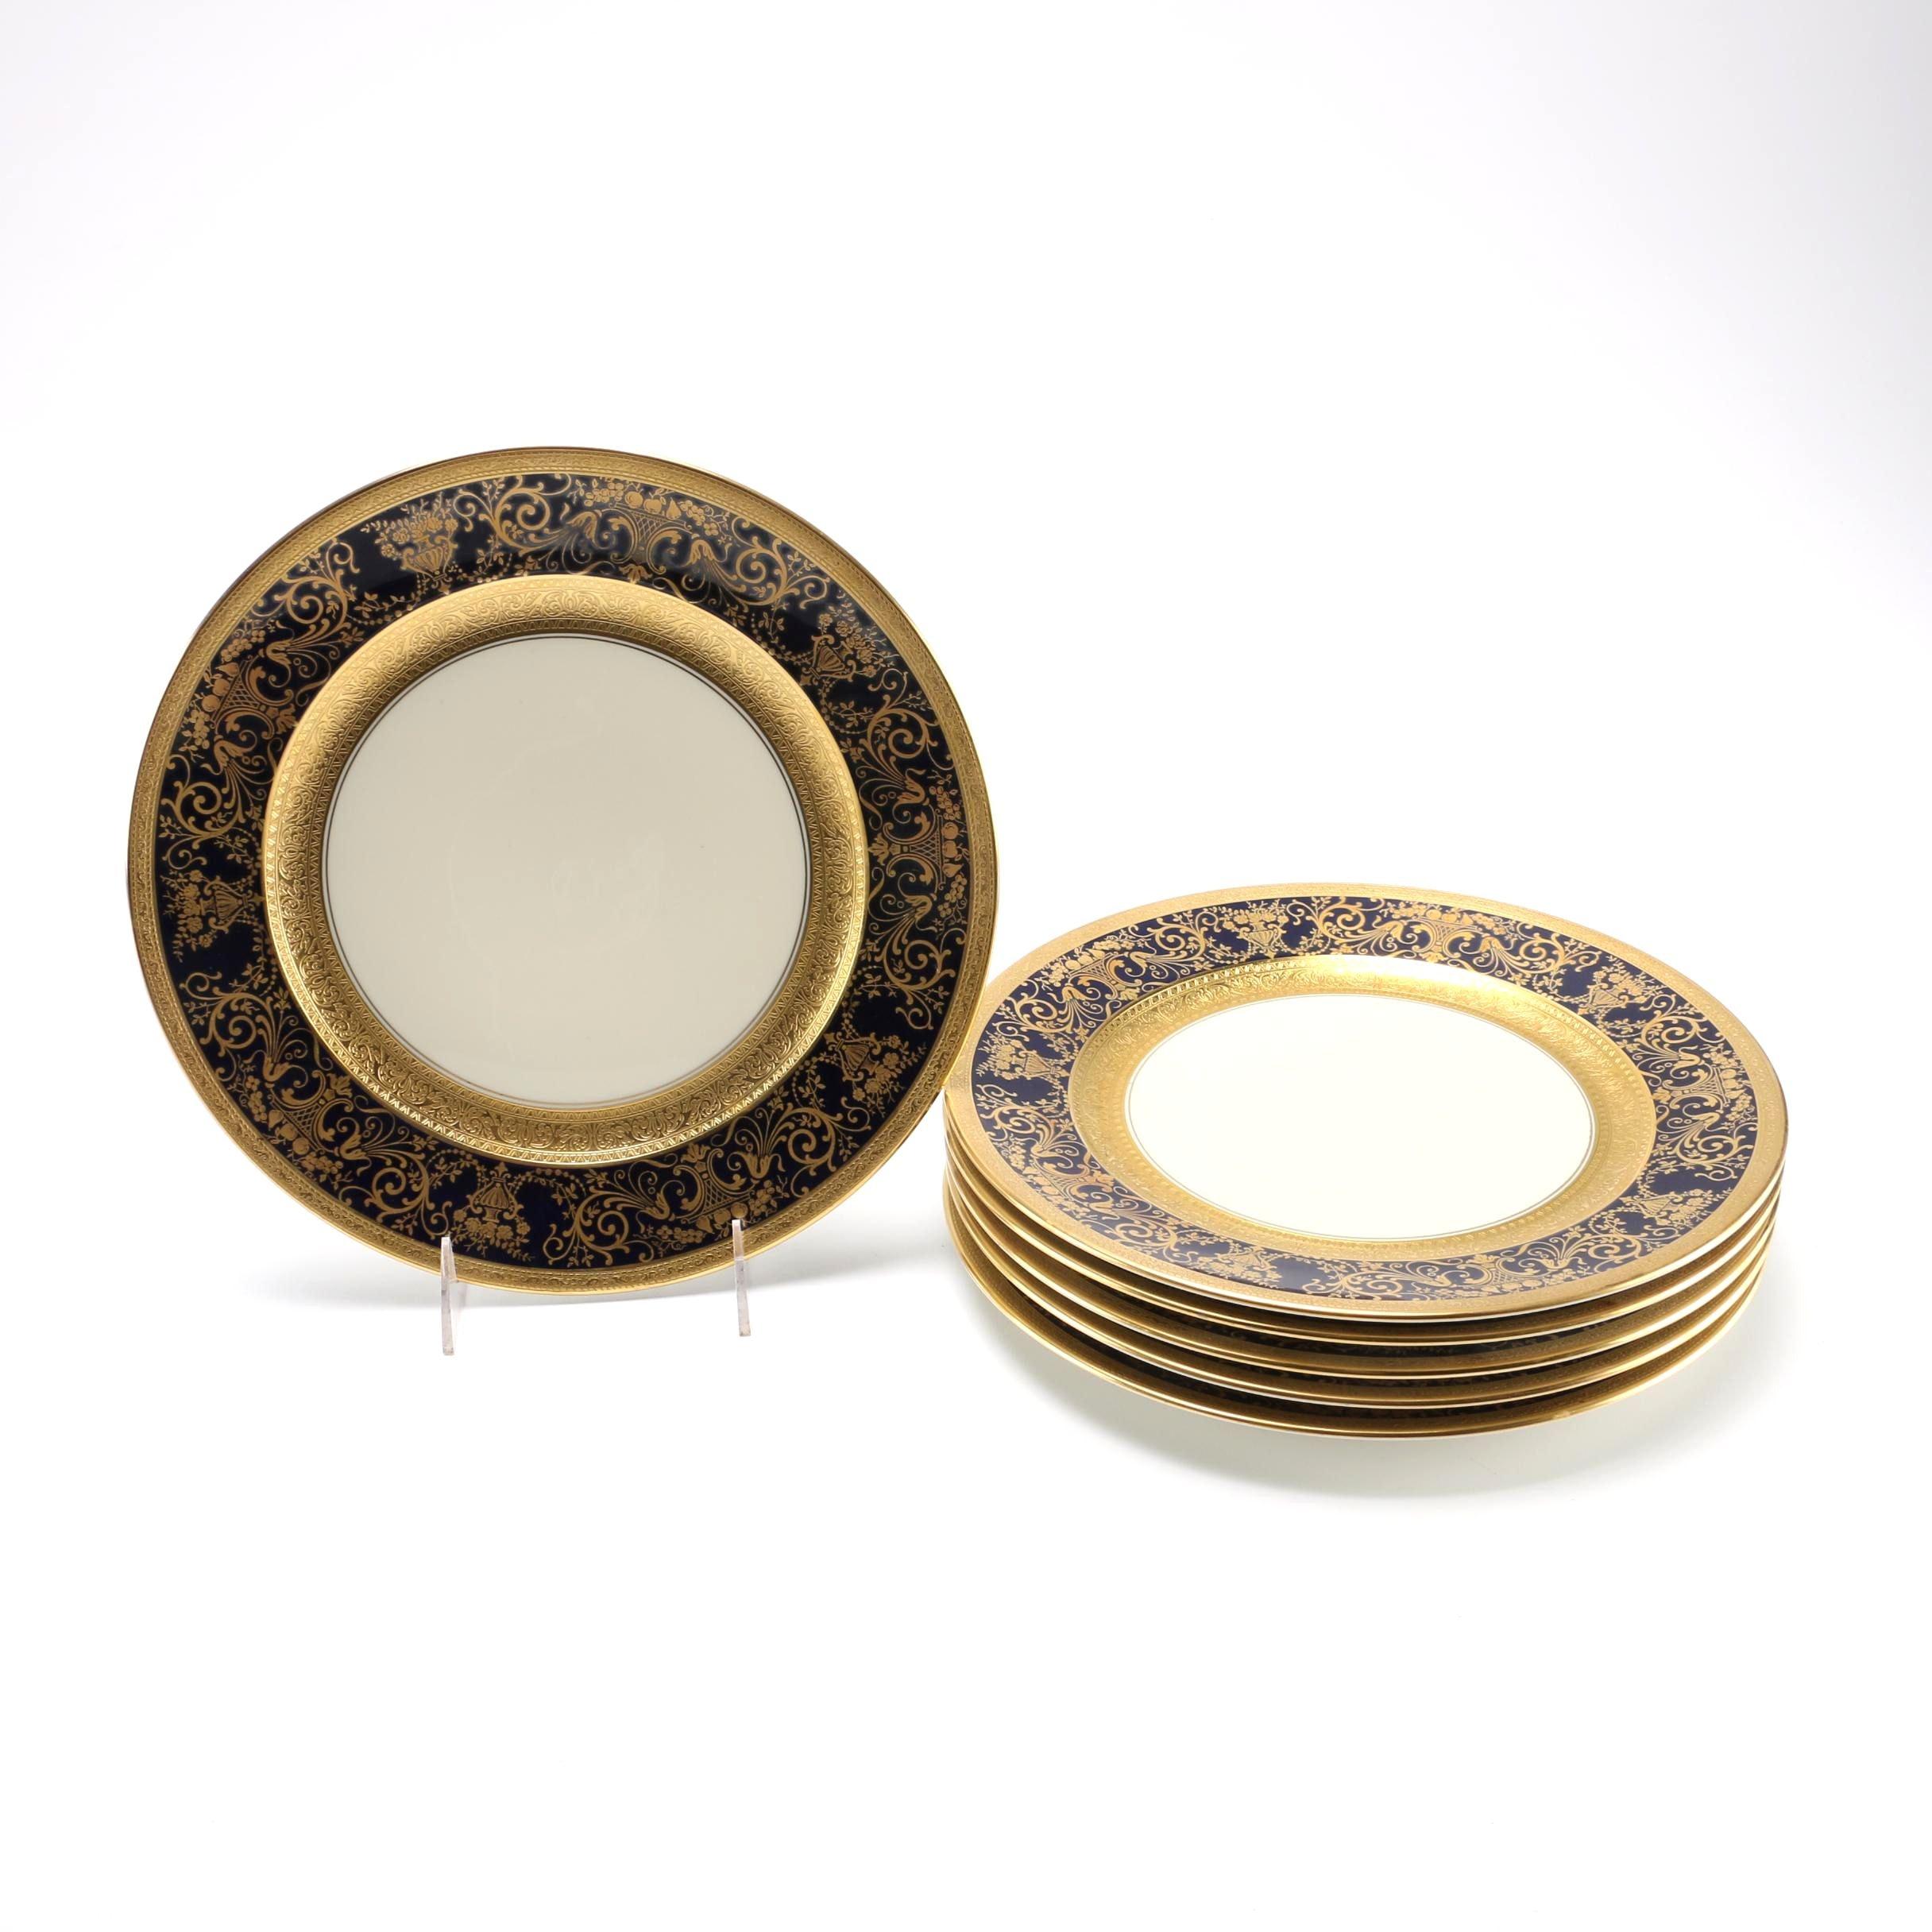 Ovingtons Gold Tone China Plates